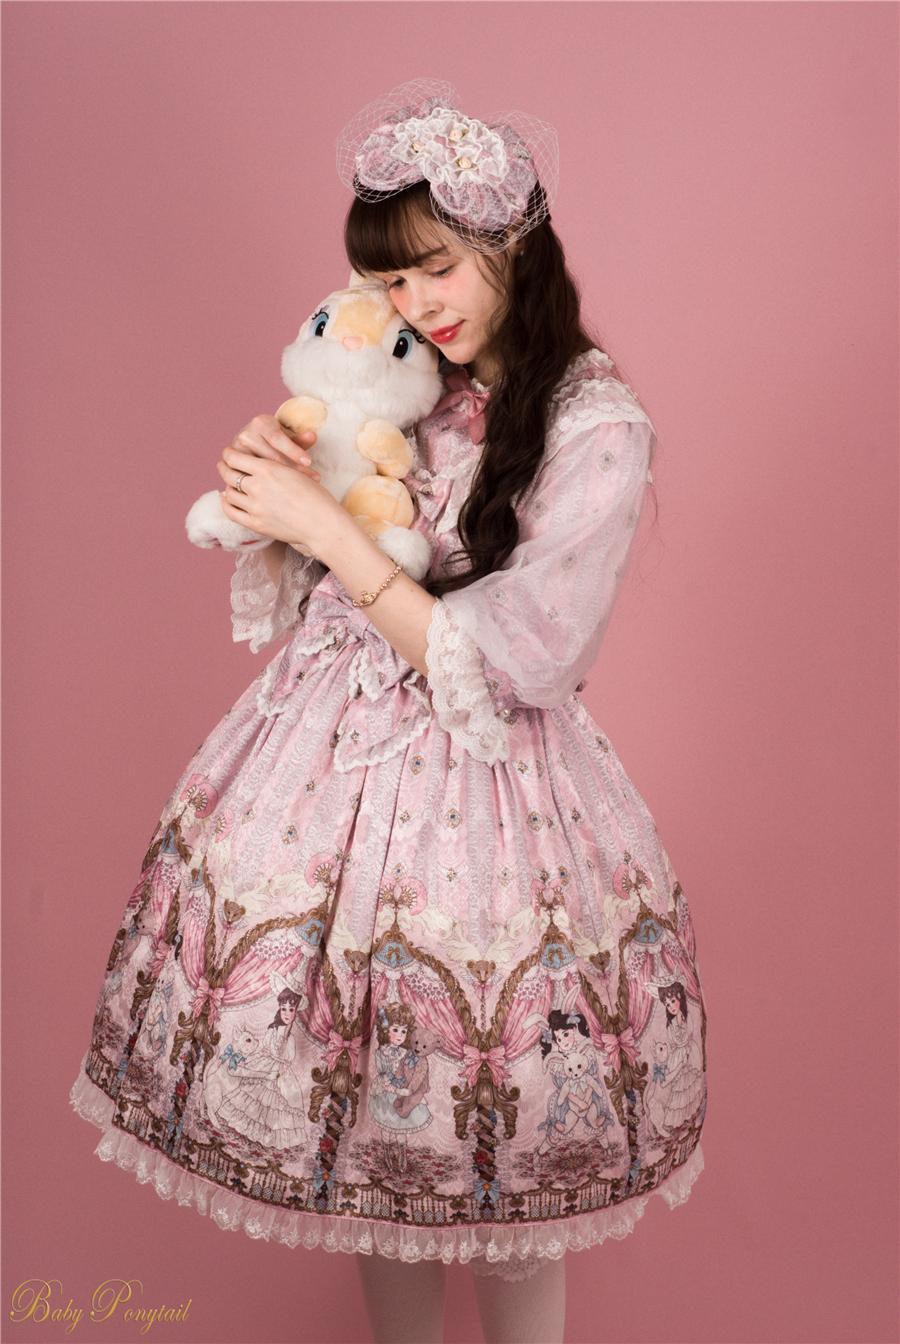 BabyPonytail_Model Photo_My Favorite Companion_OP Pink_2.jpg